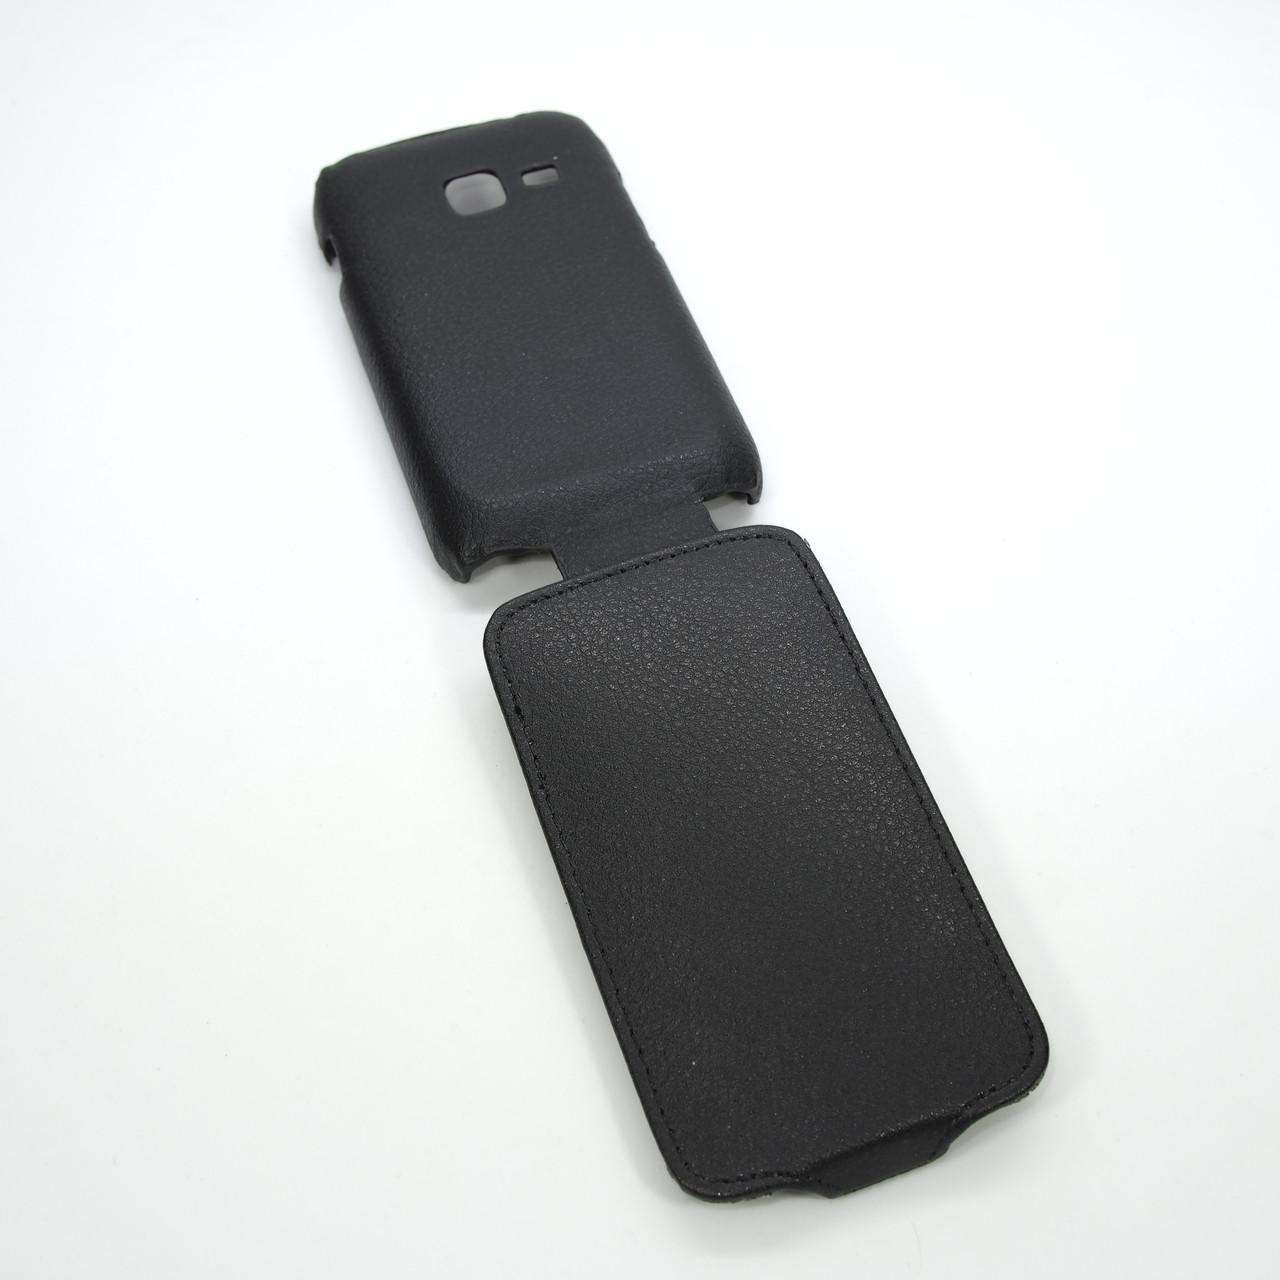 Чехол Best Vip Samsung S6802 black Galaxy Ace Duos (S6802) Для телефона